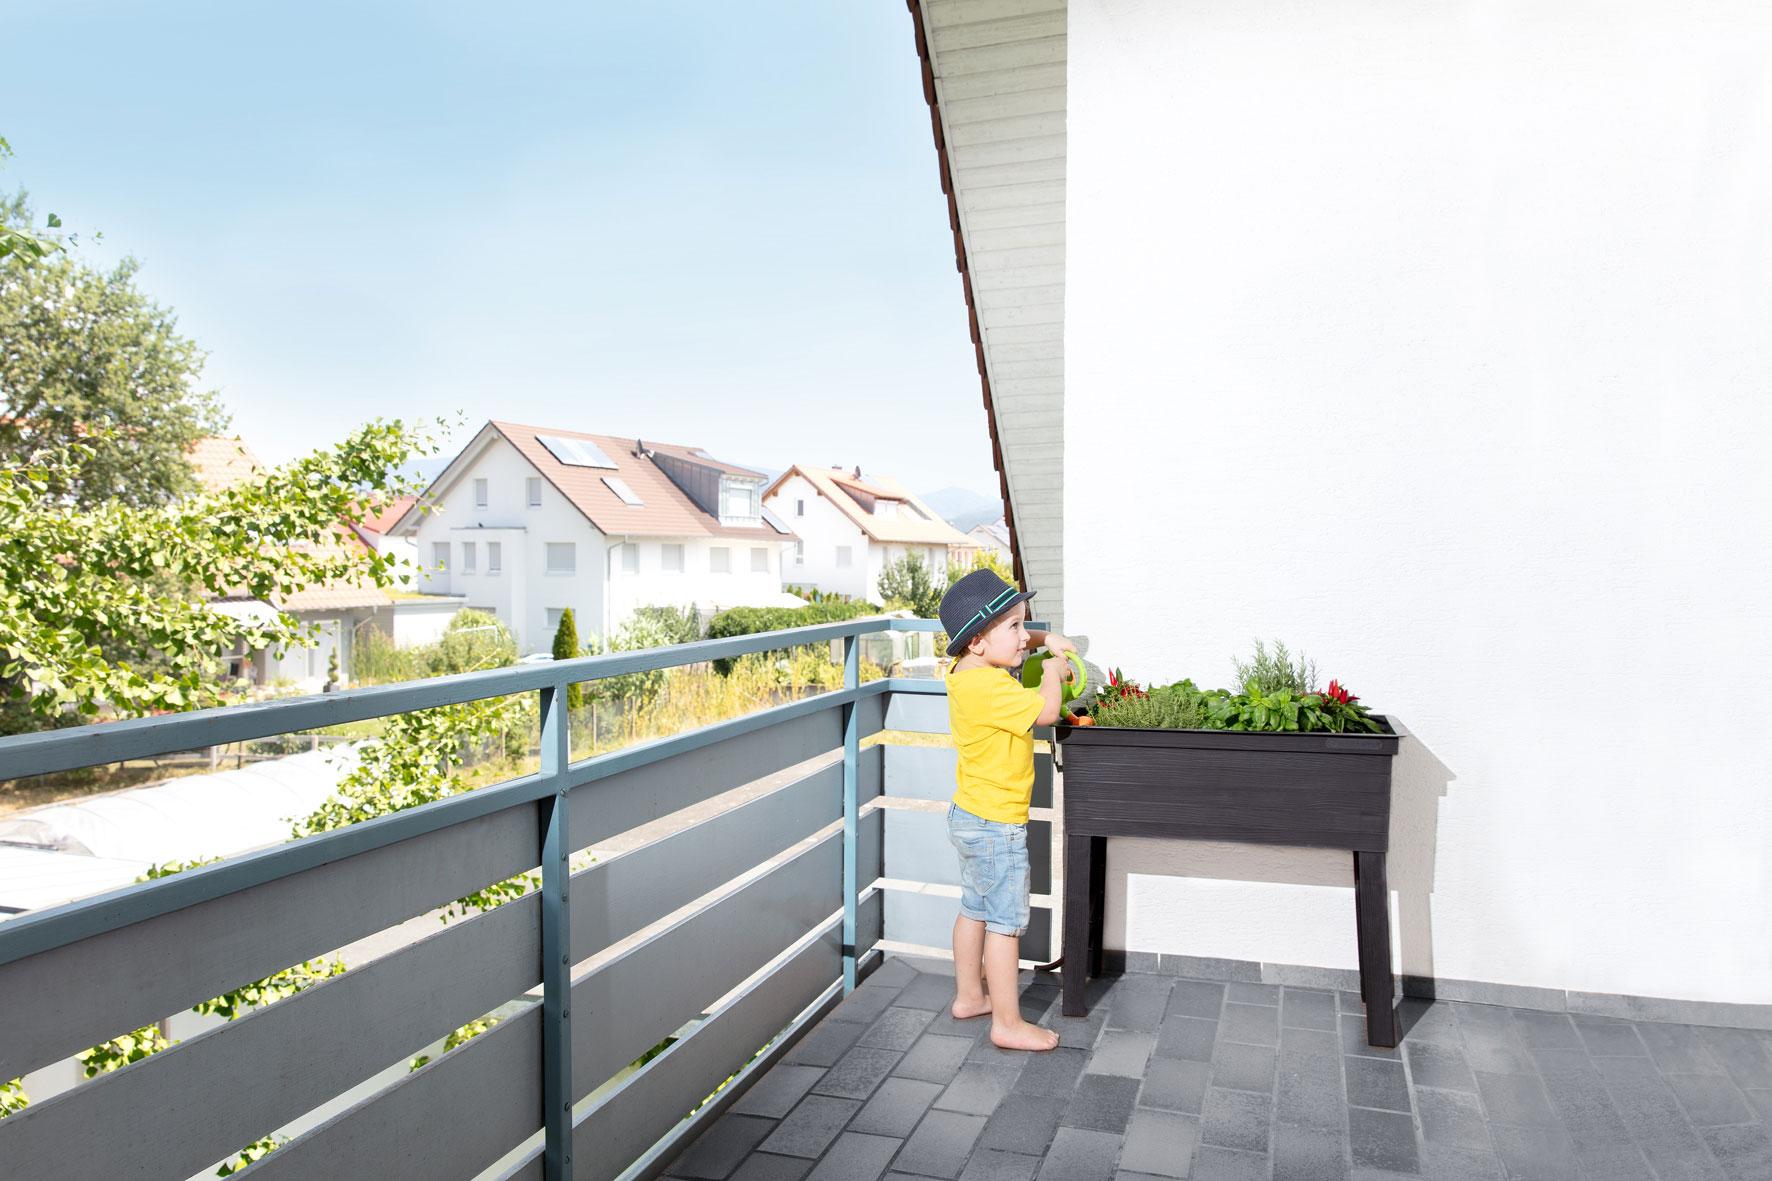 Hochbeet GARANTIA Balkon-Hochbeet Urban 75x37x65cm Bild 5